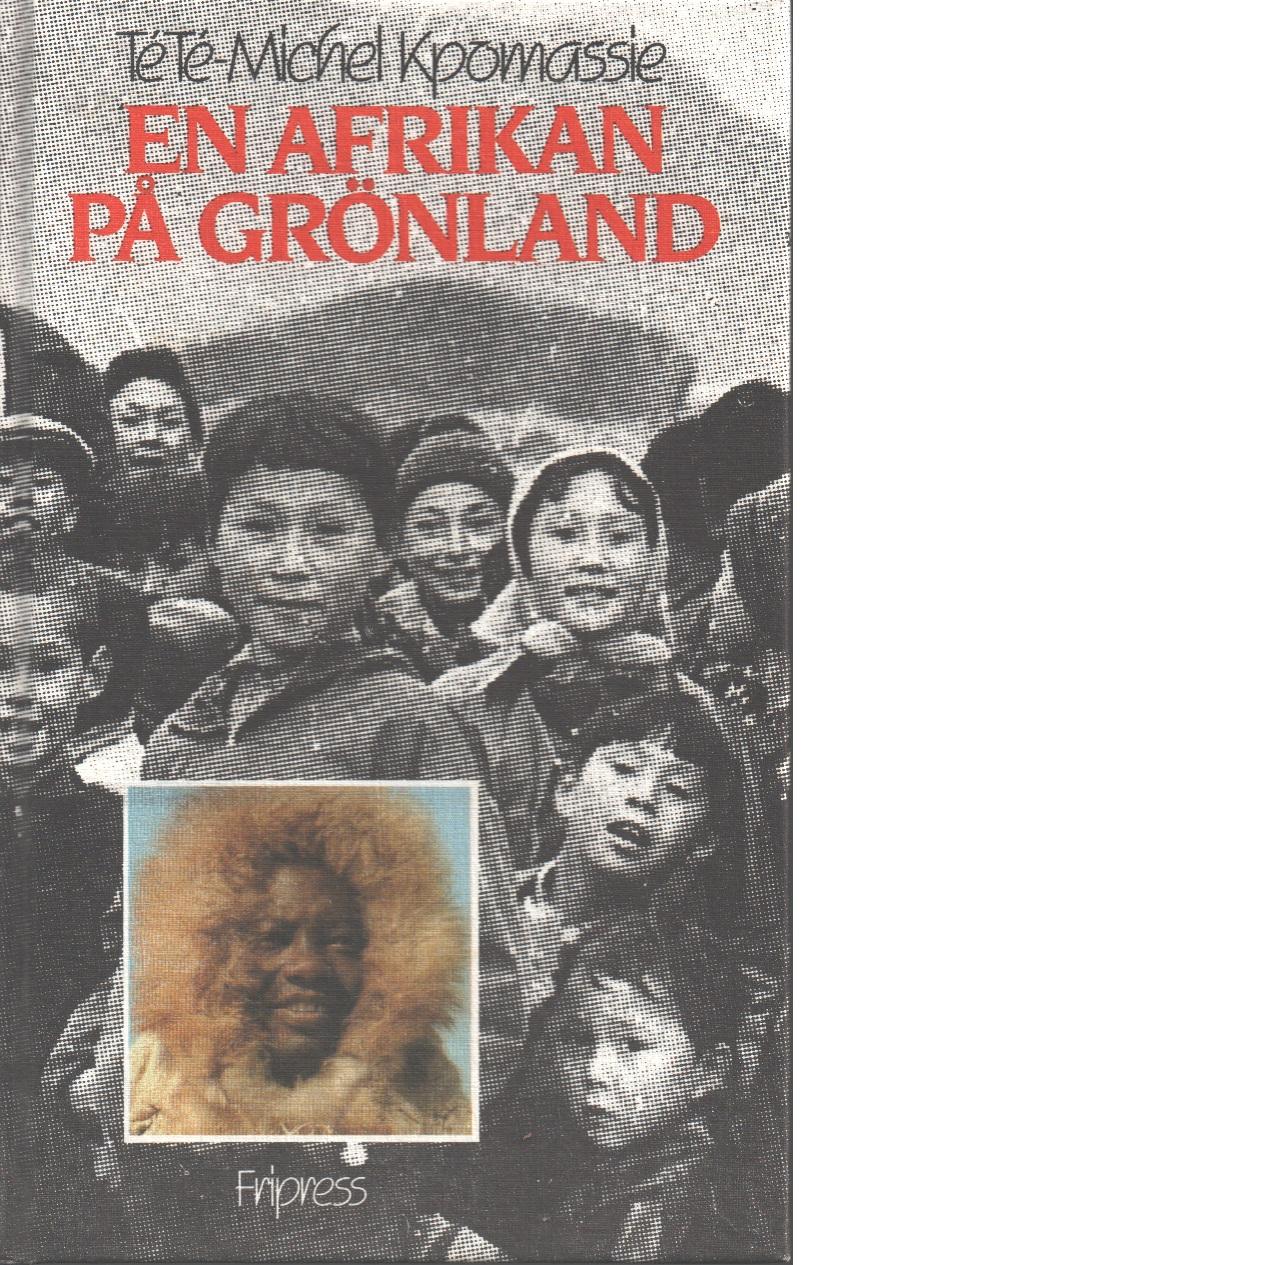 En afrikan på Grönland - Kpomassie, Tété-Michel